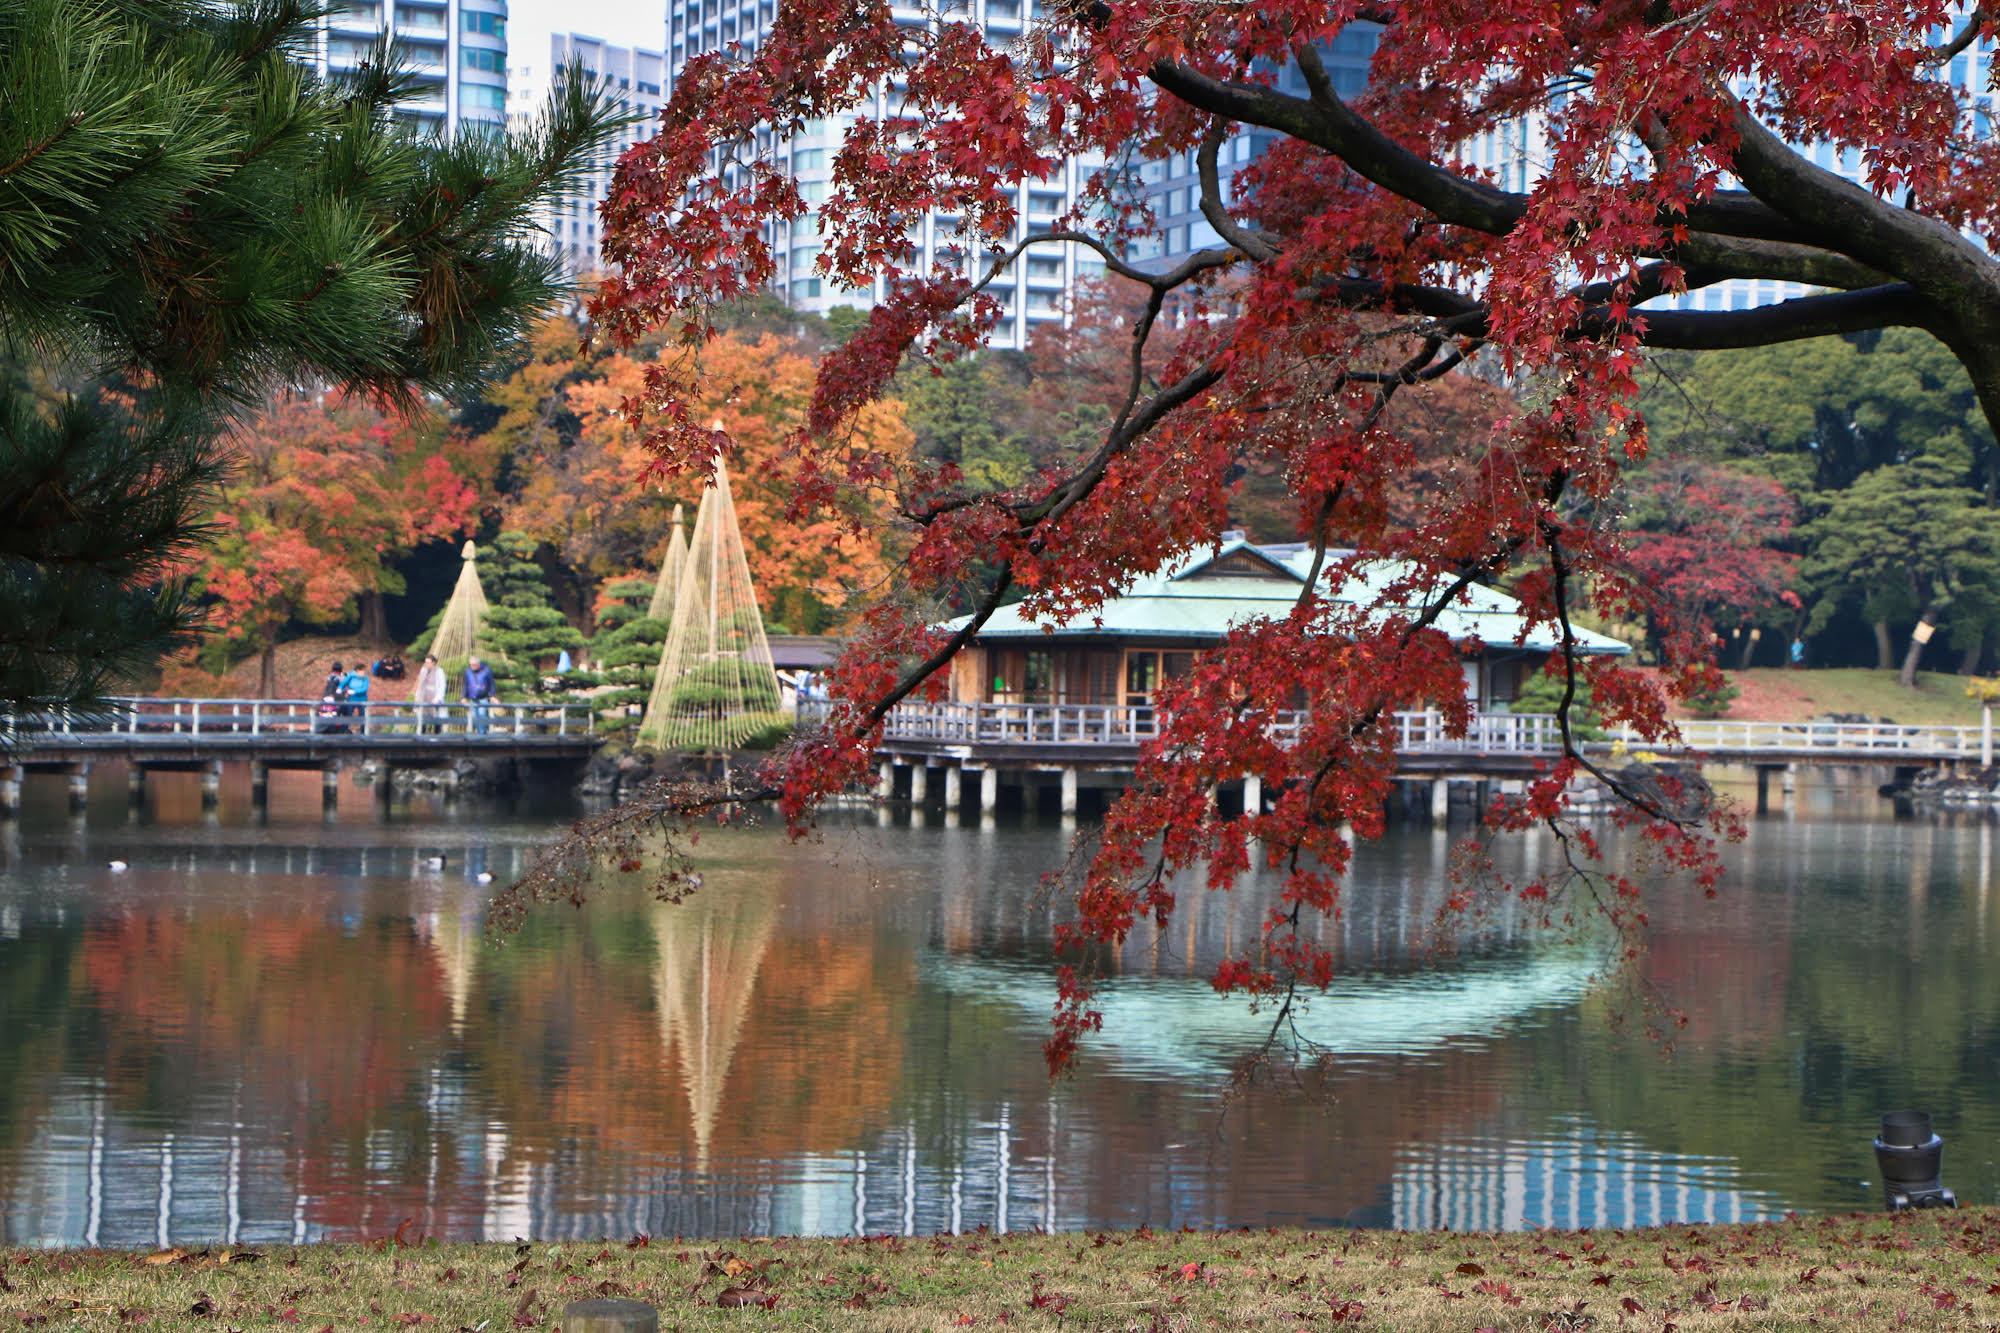 Hama-Rikyu Gardens. This used to be the private Tokyo park of the Tokugawa shoguns.